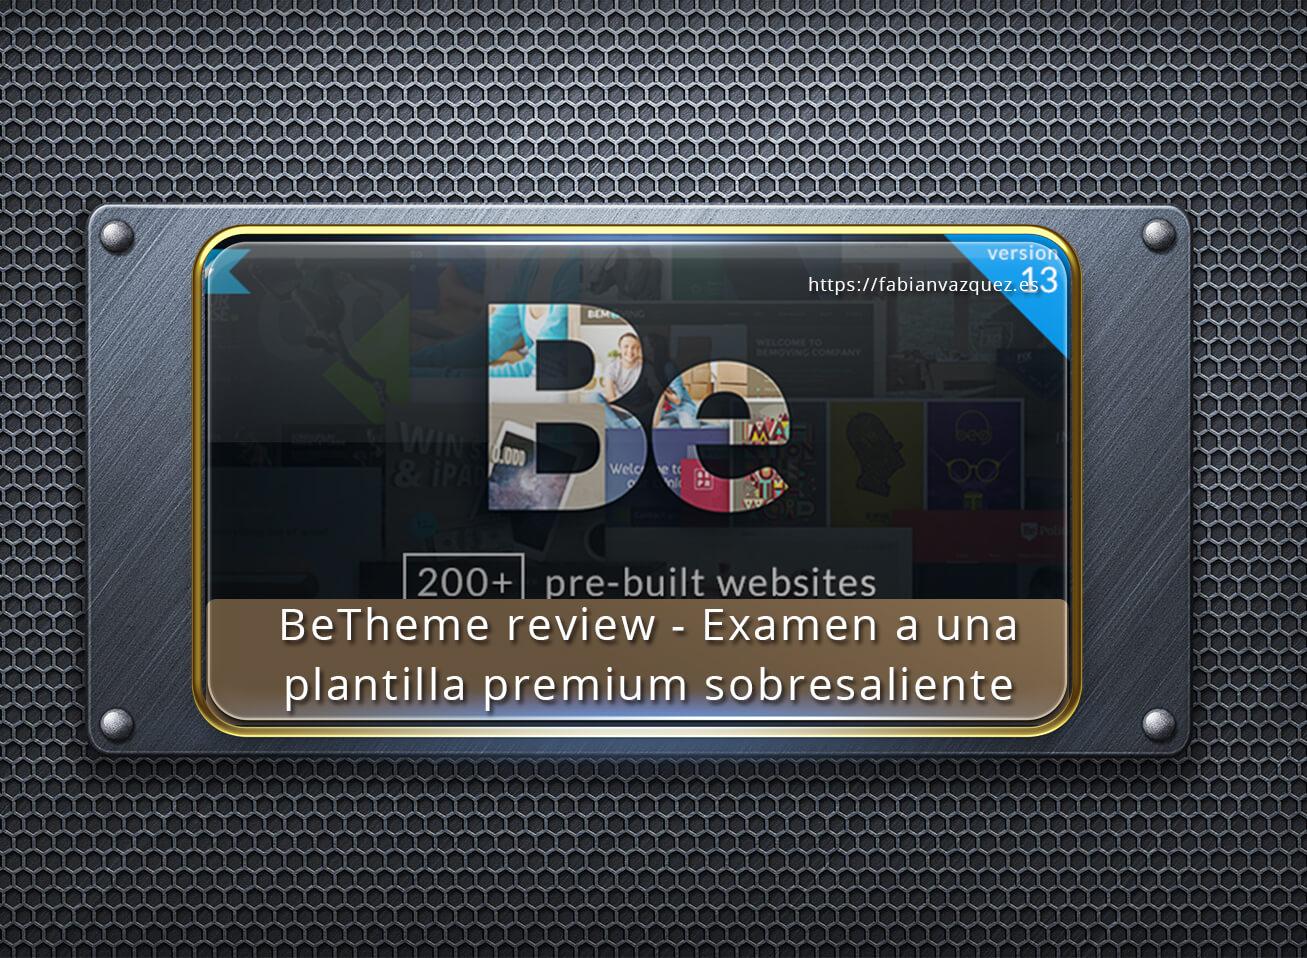 BeTheme review - Plantilla Wordpress Premium sobresaliente